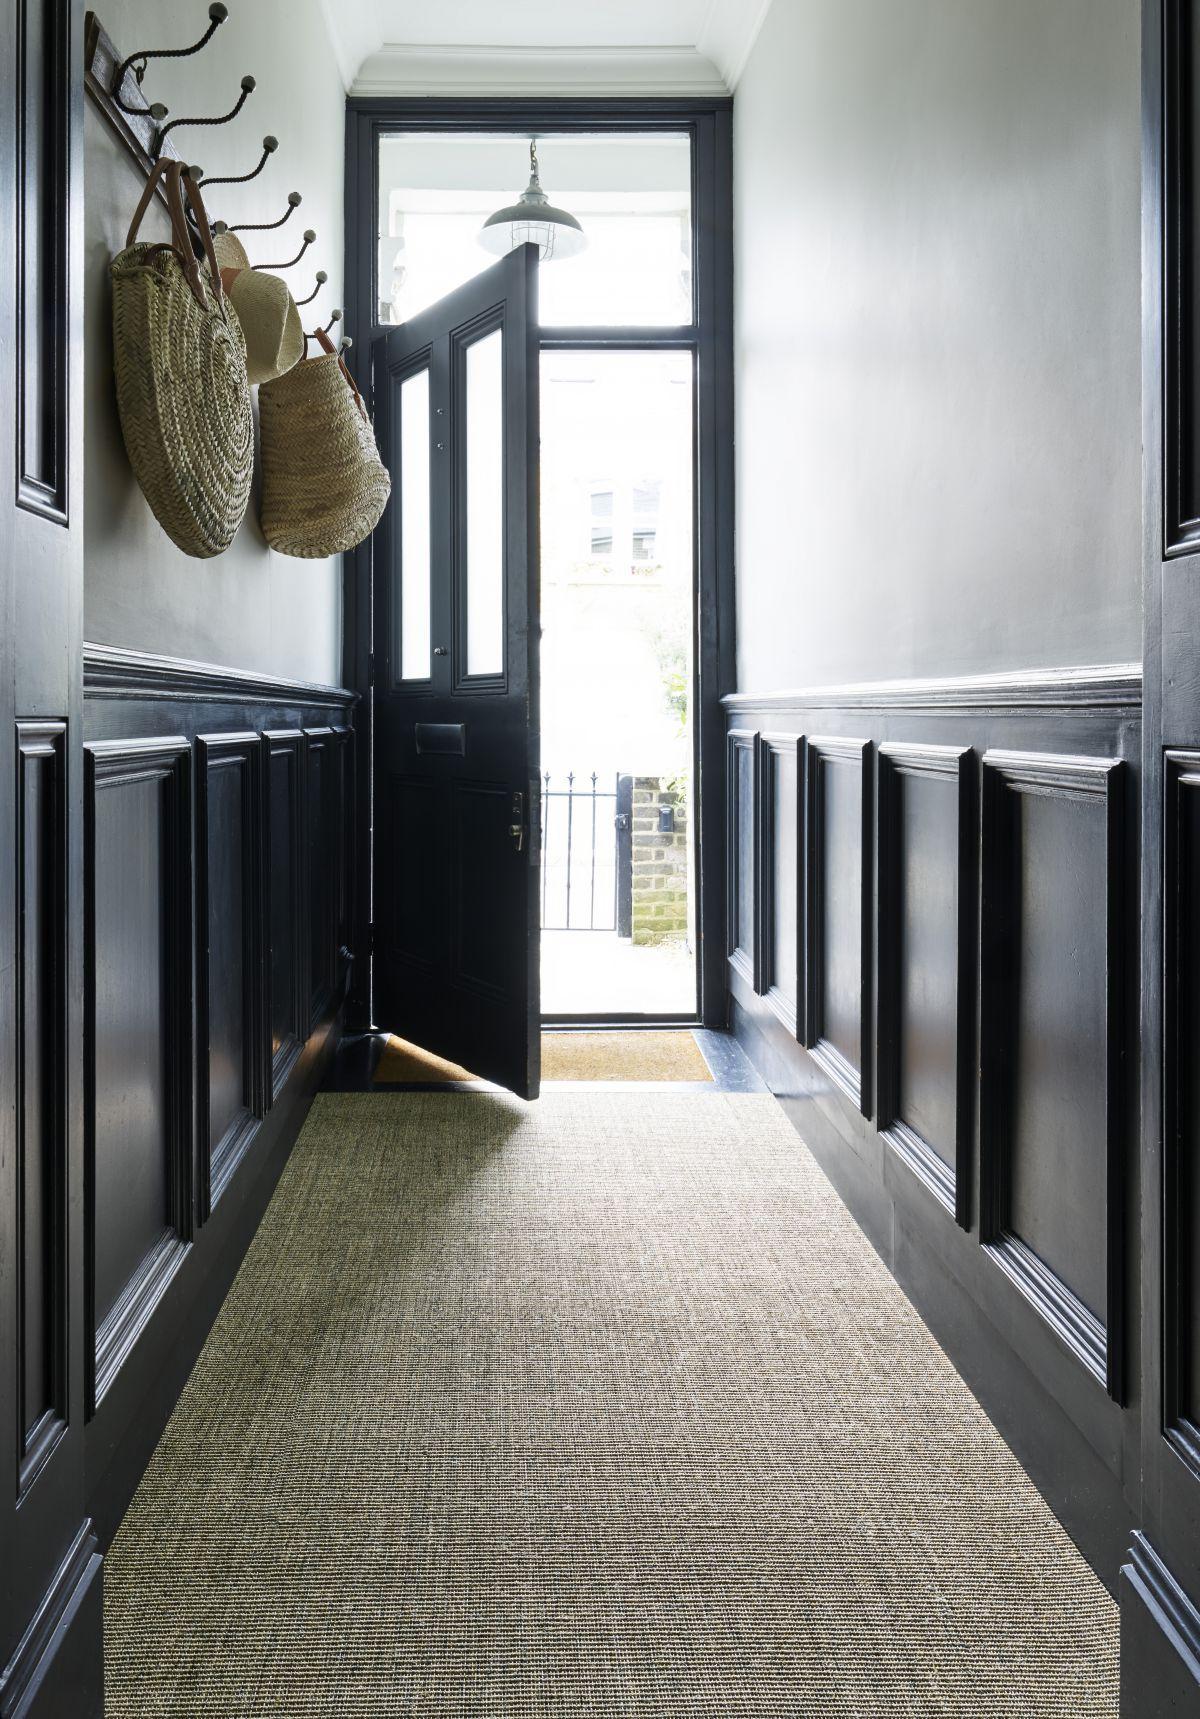 31 hallway paint ideas in 2020 | Hallway colours, Hallway ...